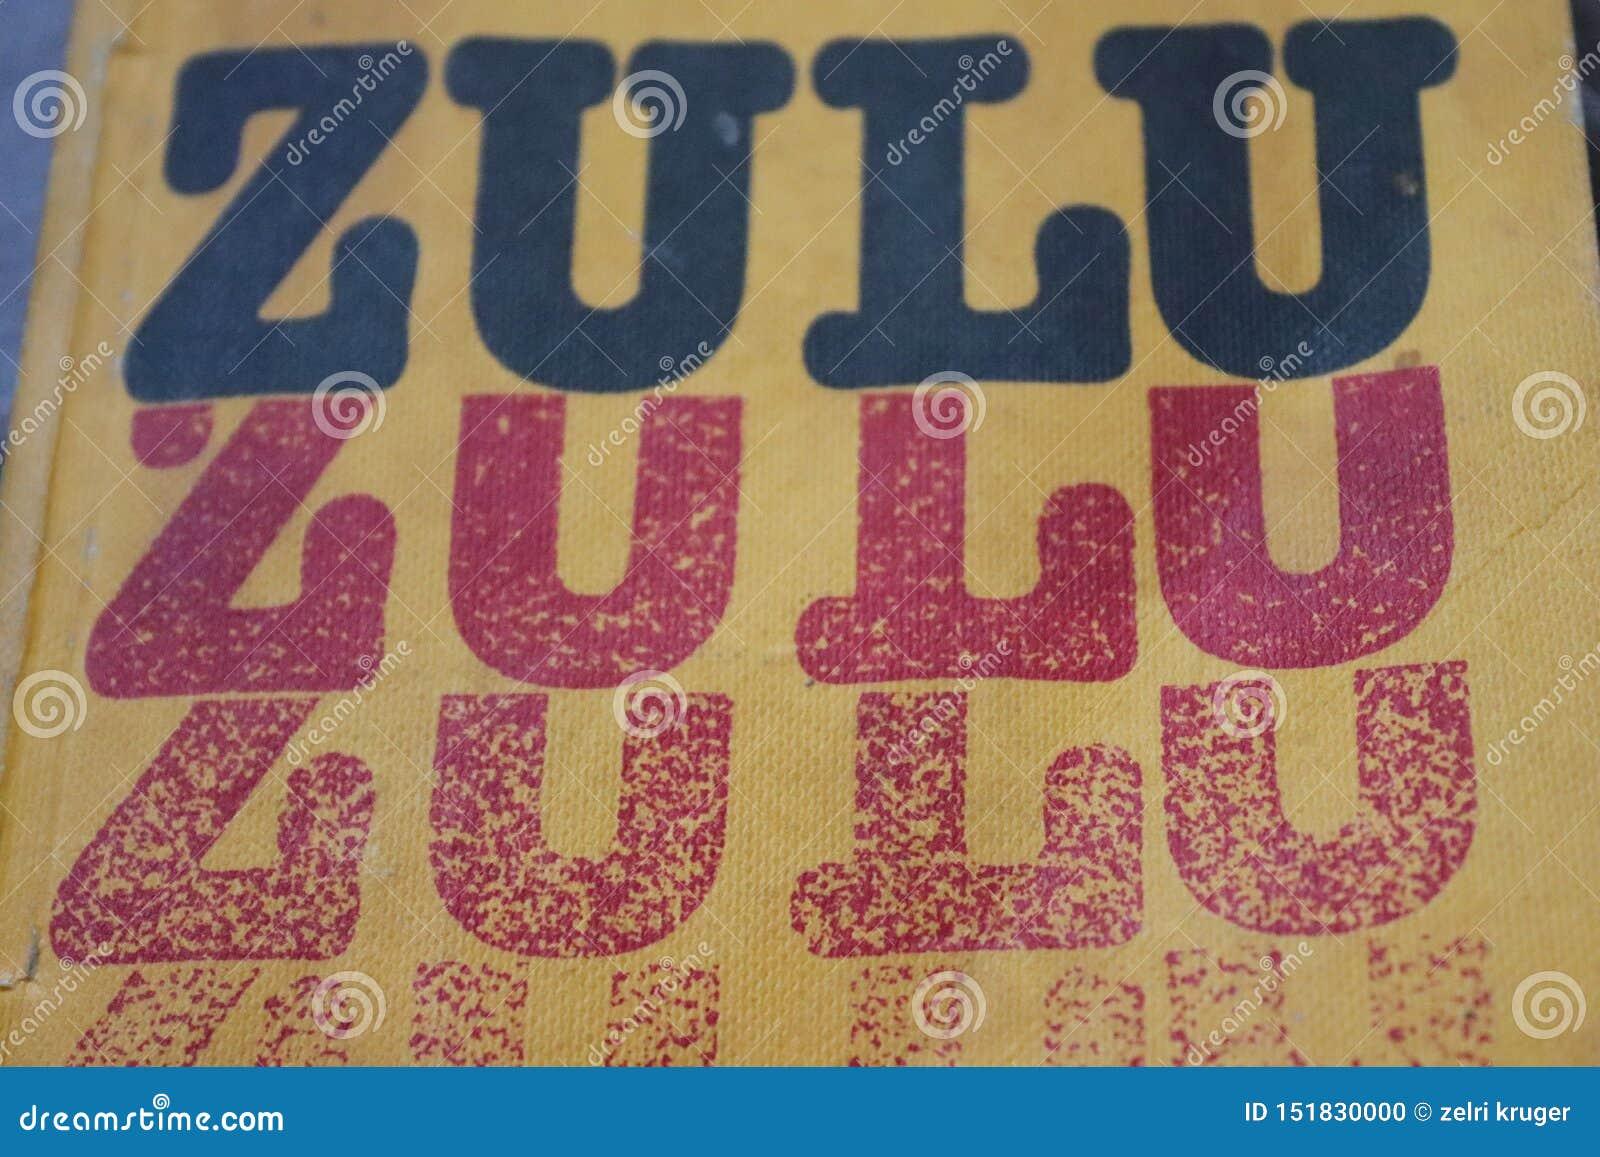 Yellow cover of Zulu language book